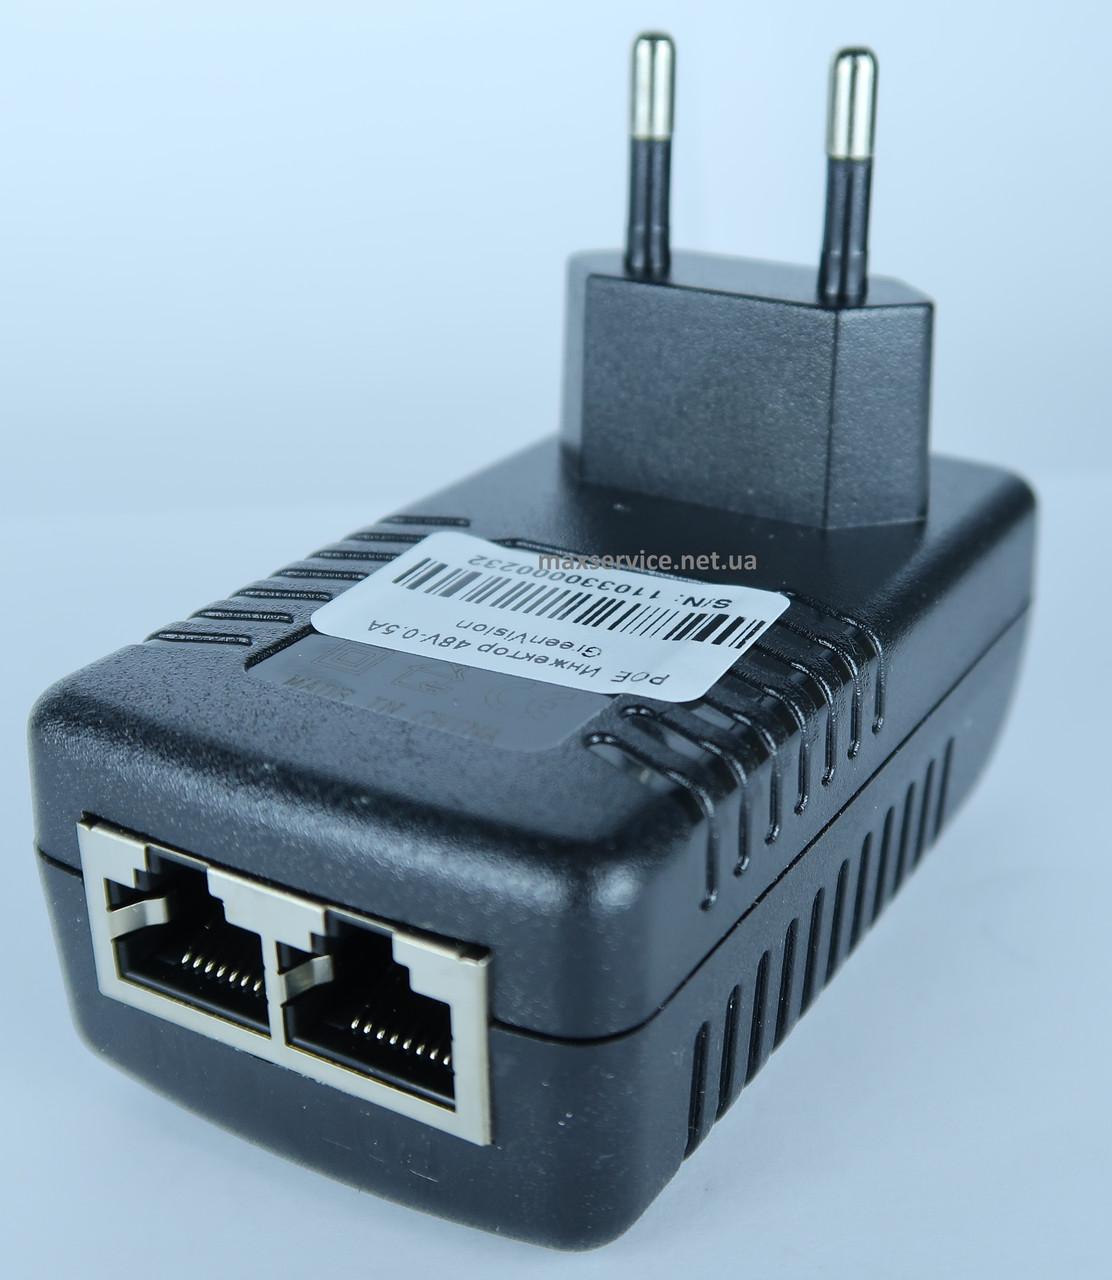 POE инжектор 48V - 0.5A